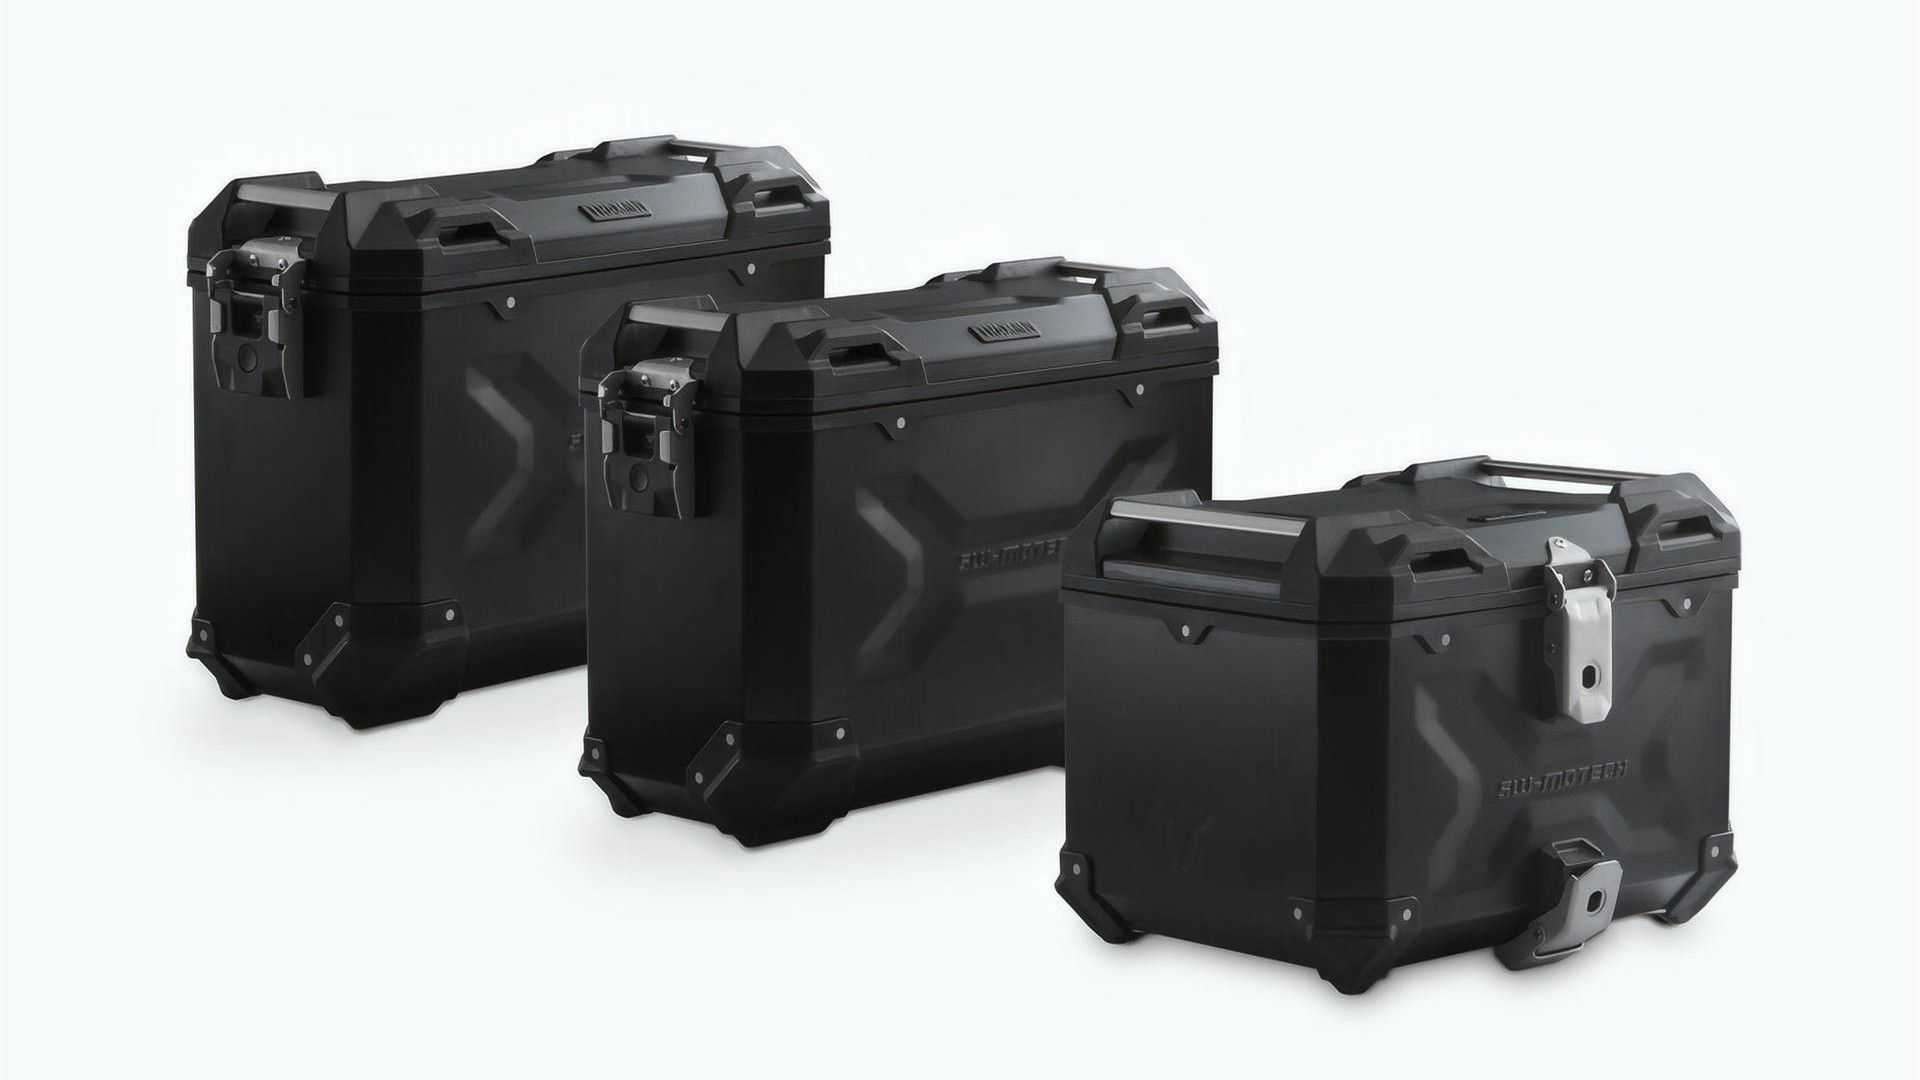 Benelli TRK 502 X with SW-Motech Adventure Set Luggage in Black - Off Bike